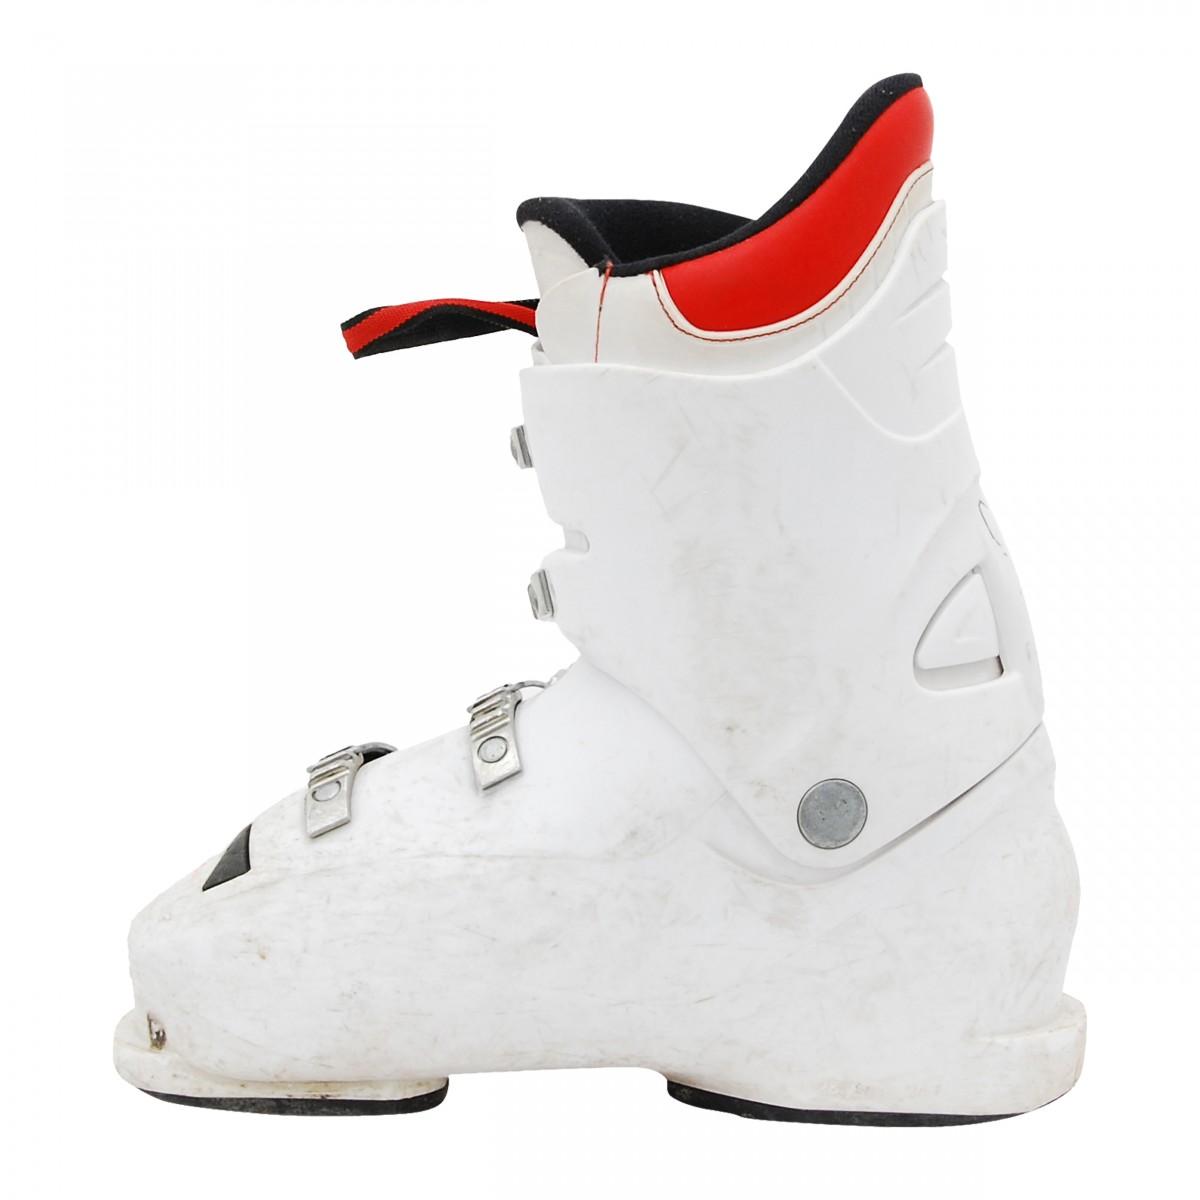 Chaussure-de-ski-occasion-junior-Rossignol-Hero-J3-J4 miniature 6